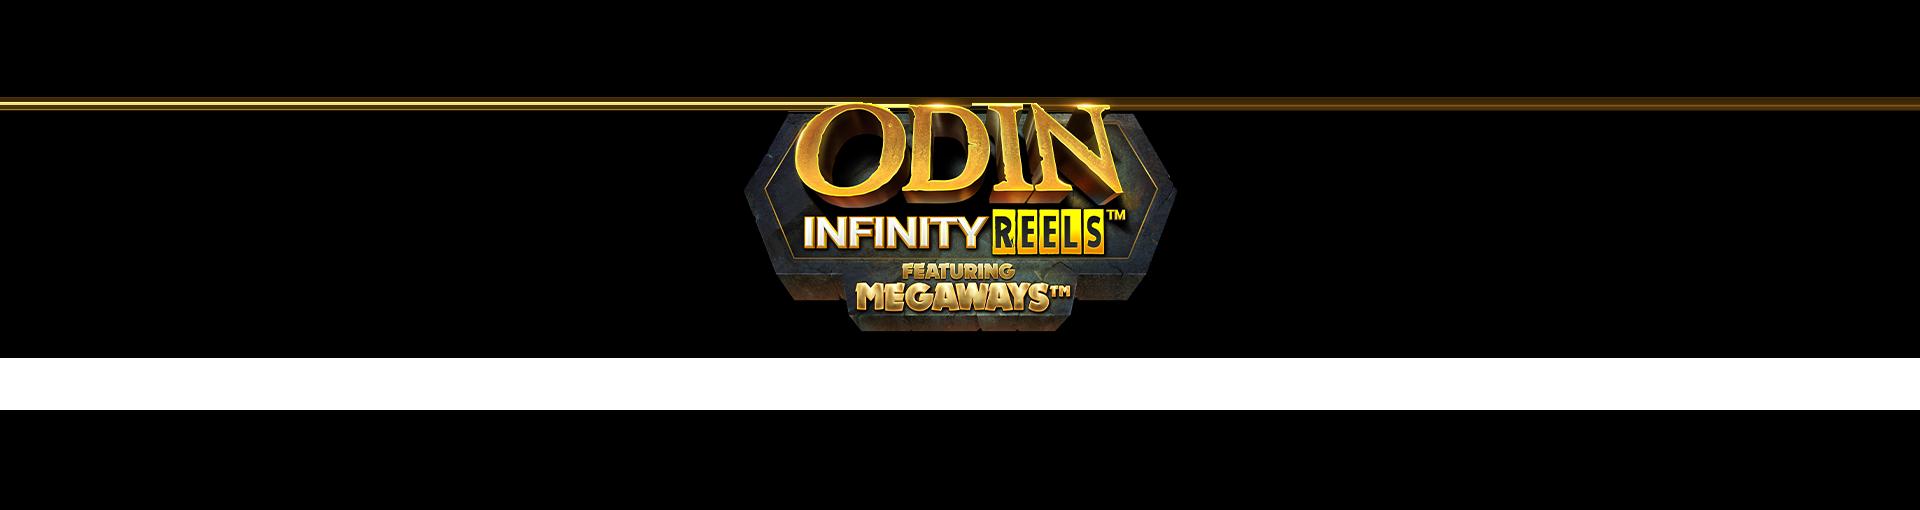 odin_Yggdrasil-UpcomingGame-Logo-Template-1920x510px